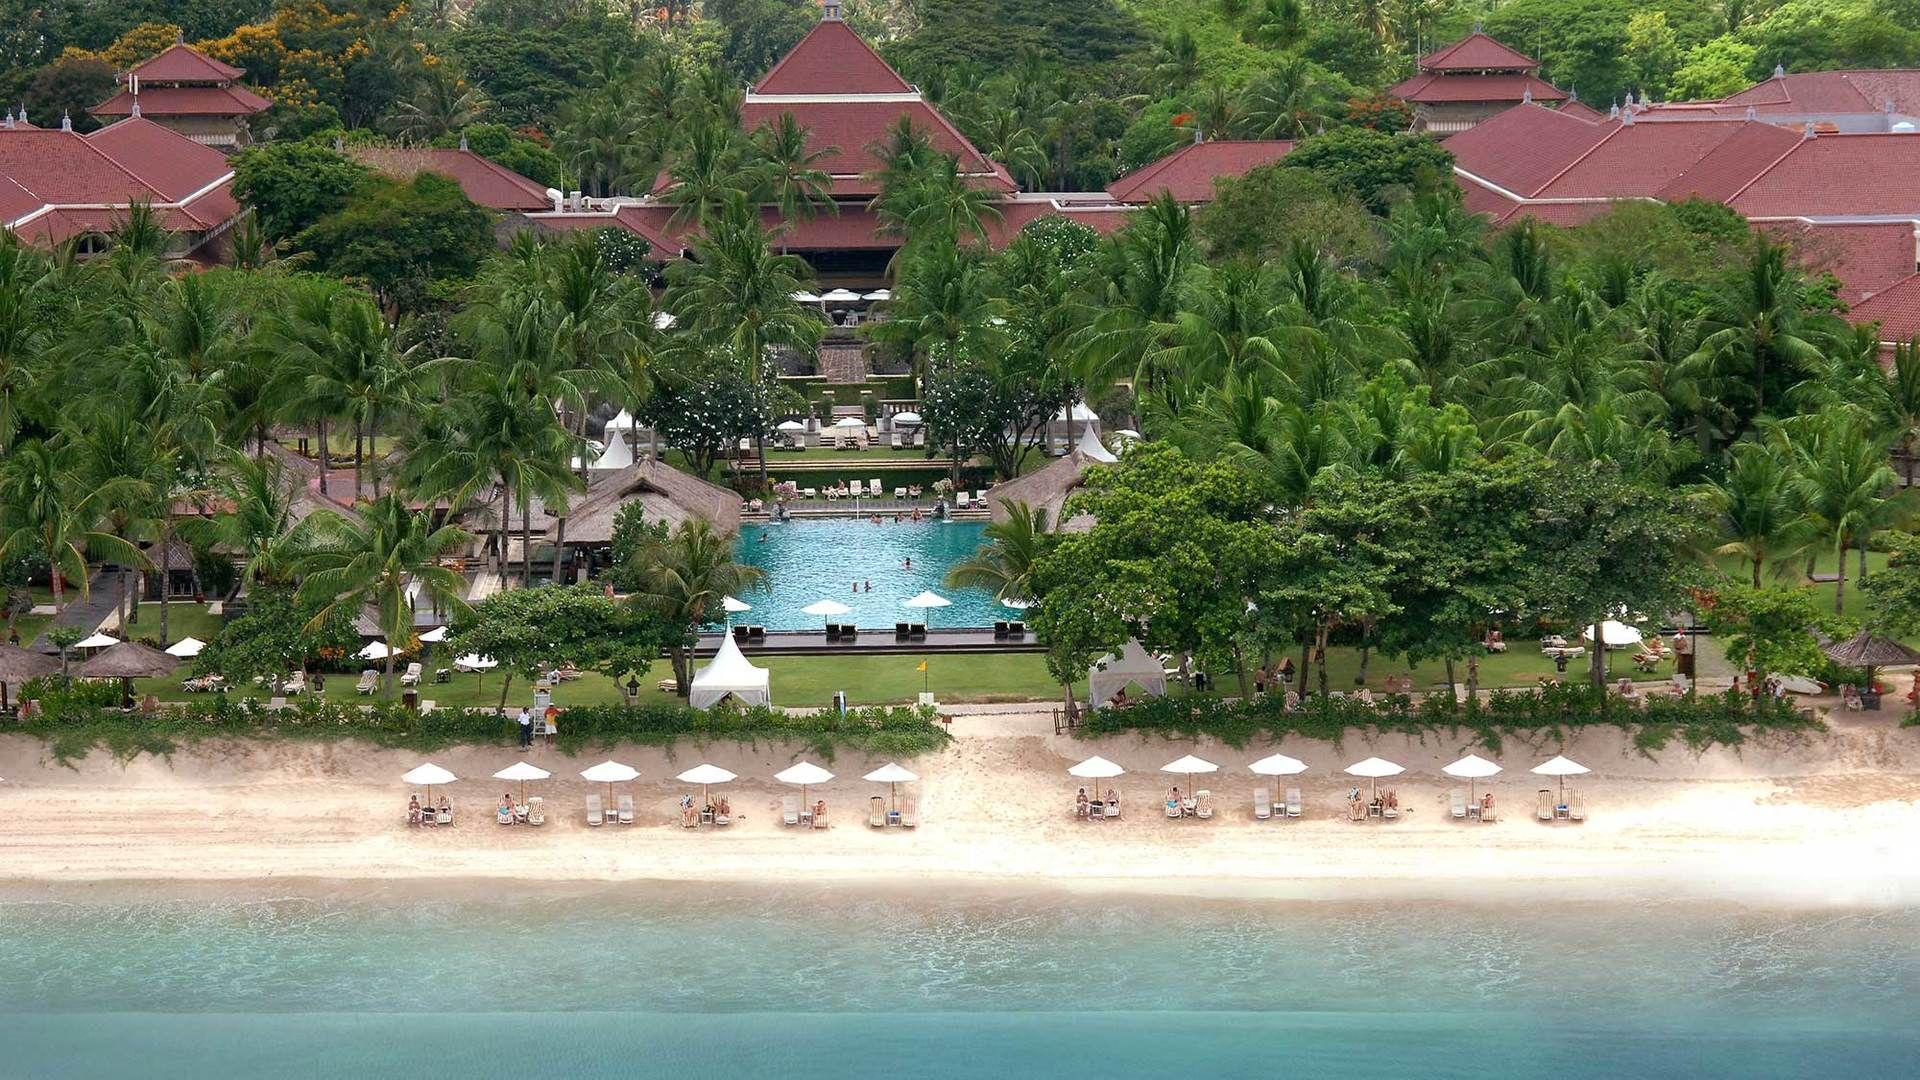 Intercontinental Bali Resort Beach Aerial View